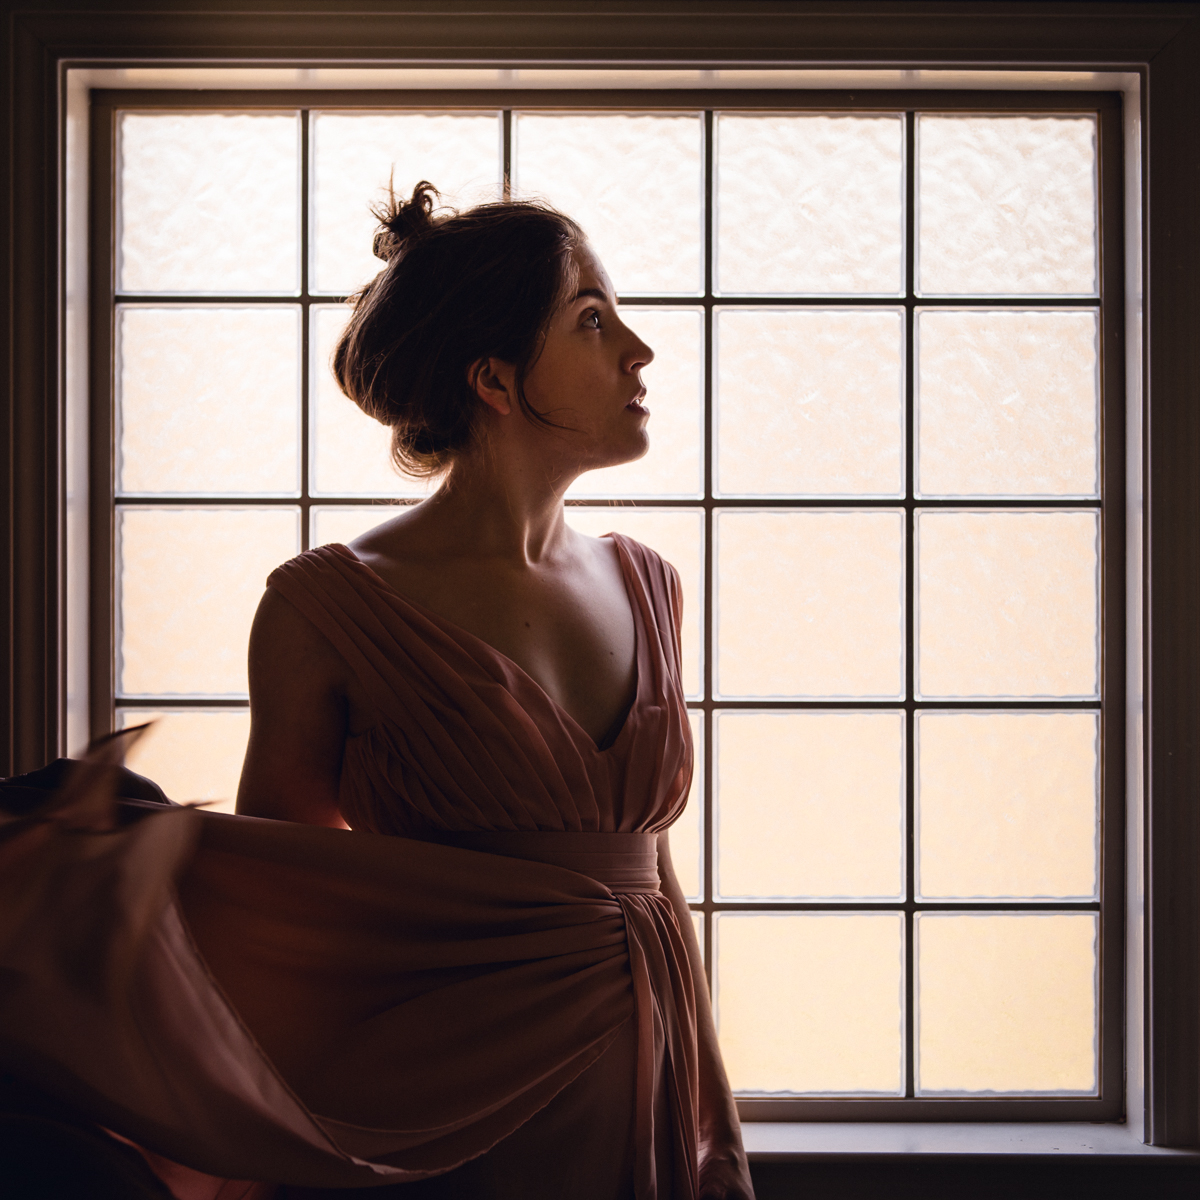 Studio Lighting Vs Natural Light: January Self Portraits